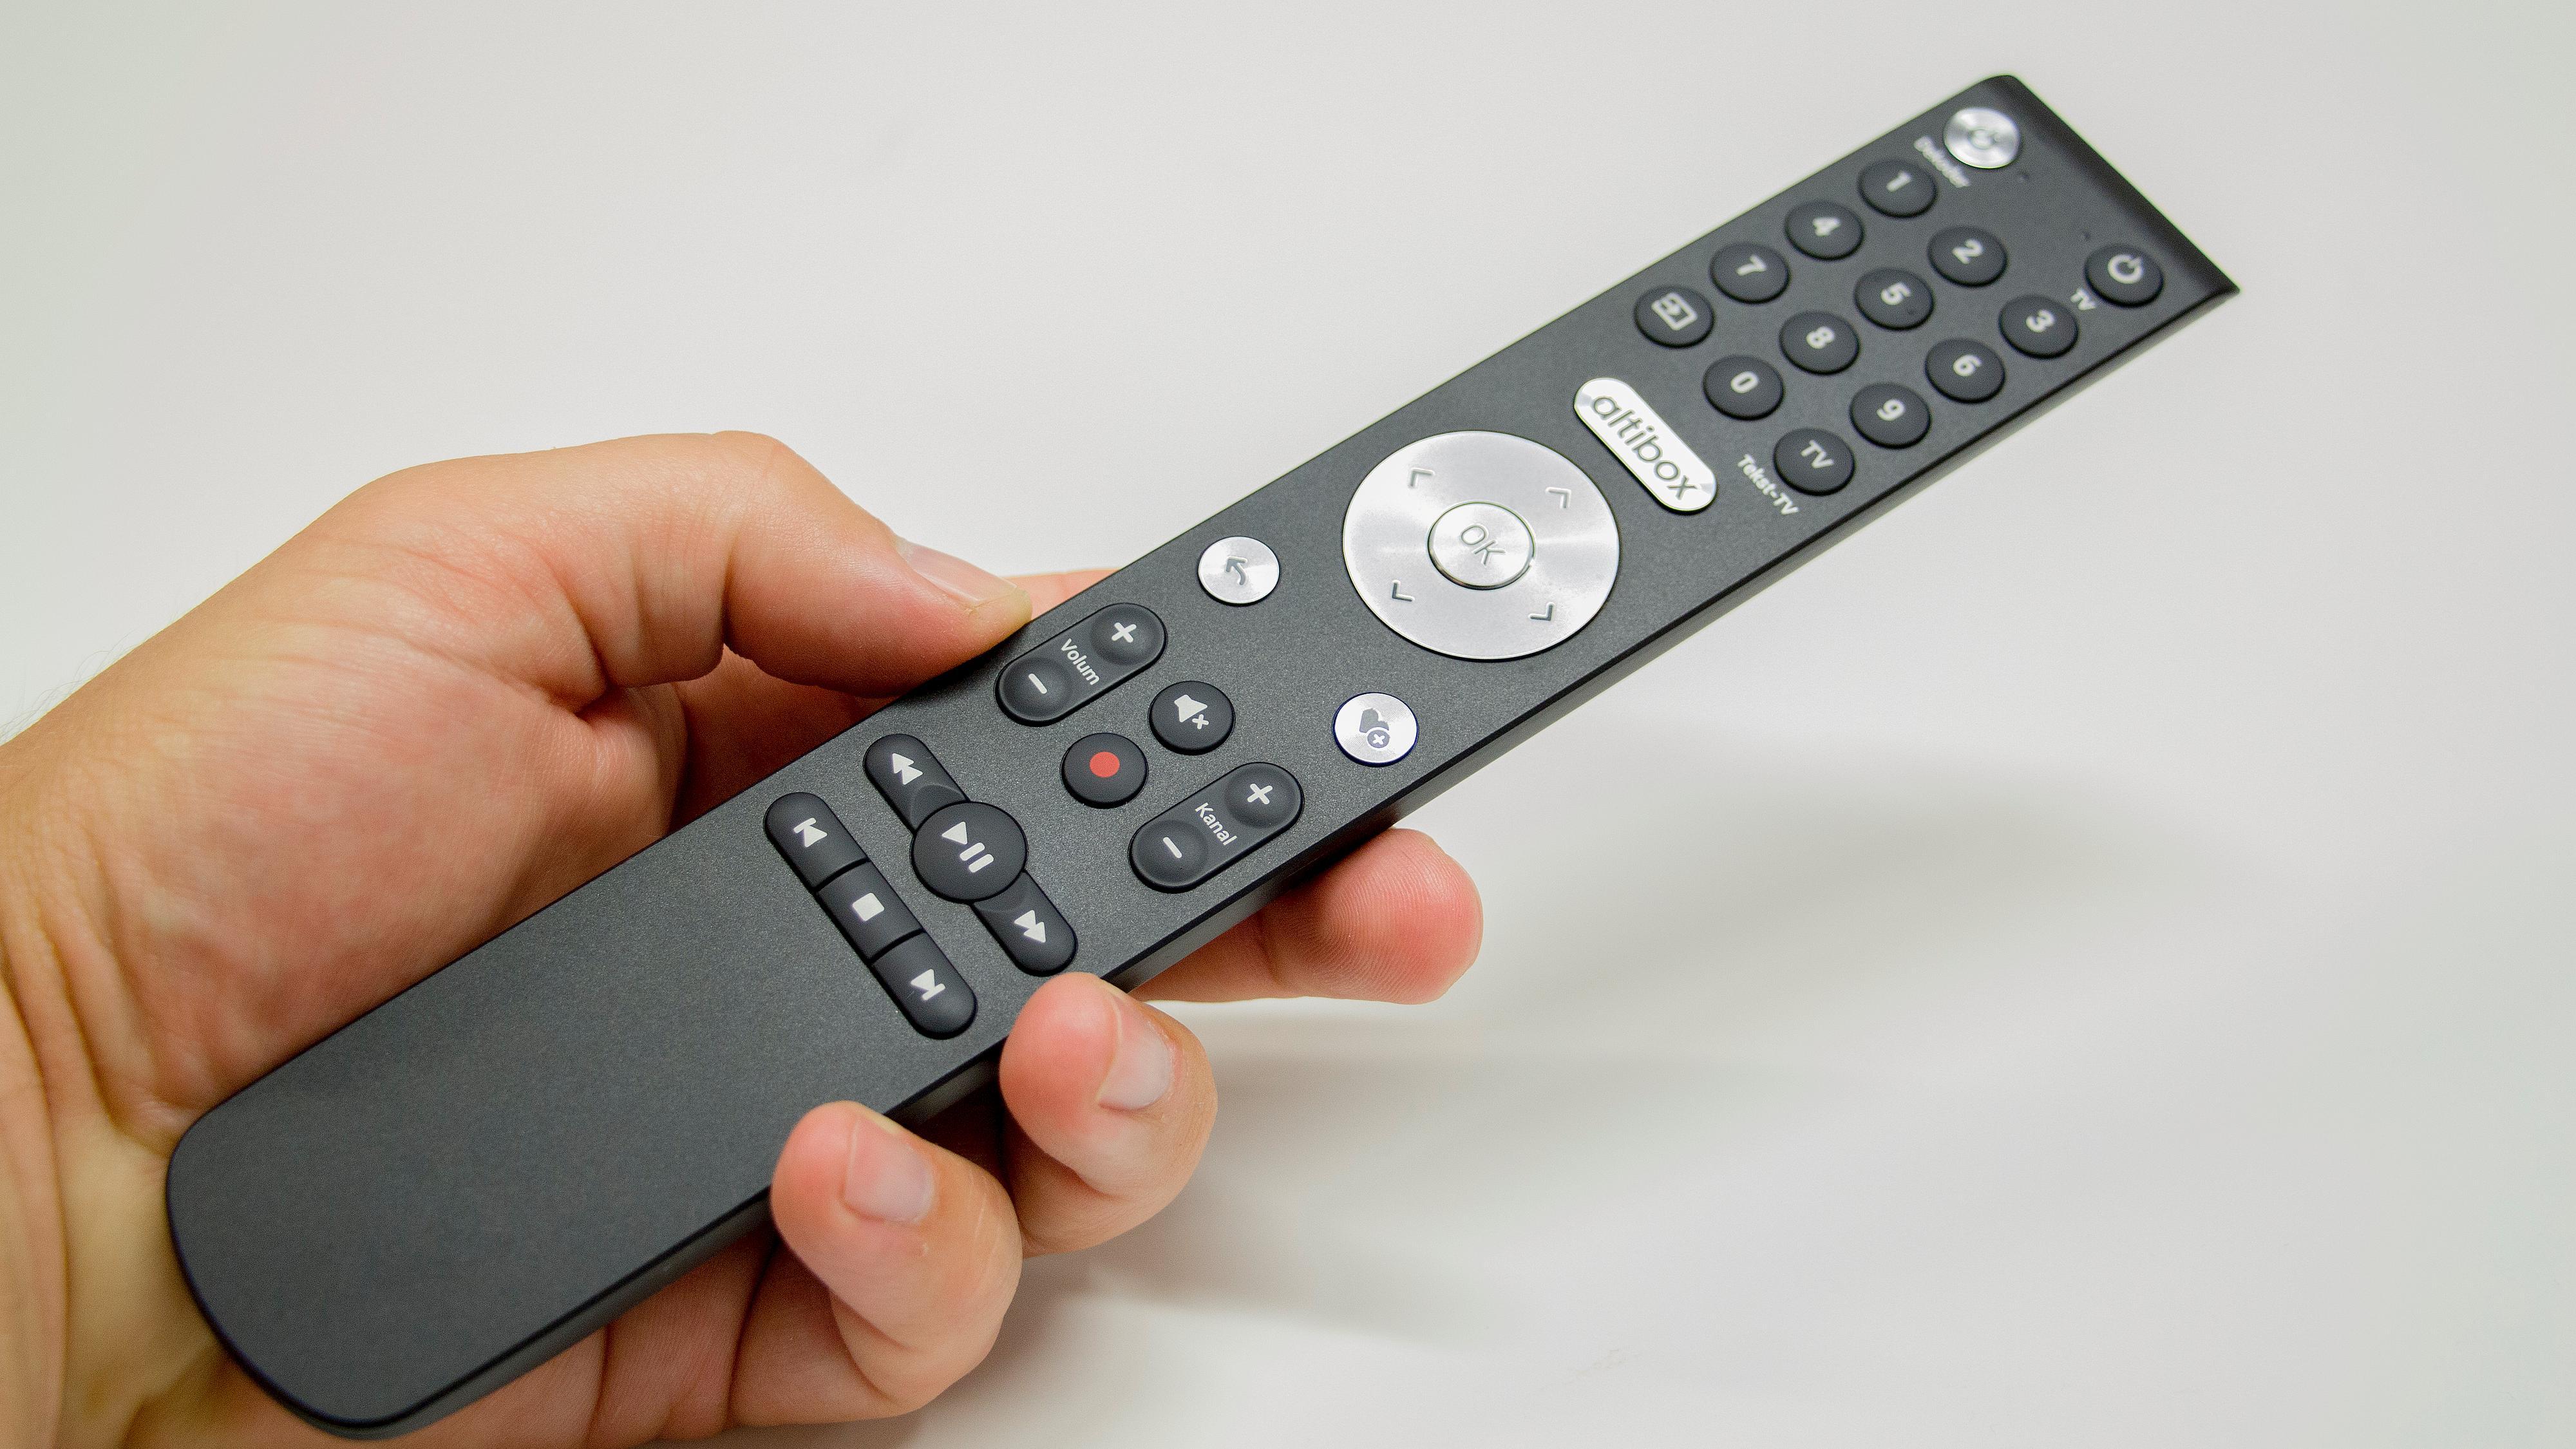 Fjernkontrollen som følger med har gode og responsive knapper.